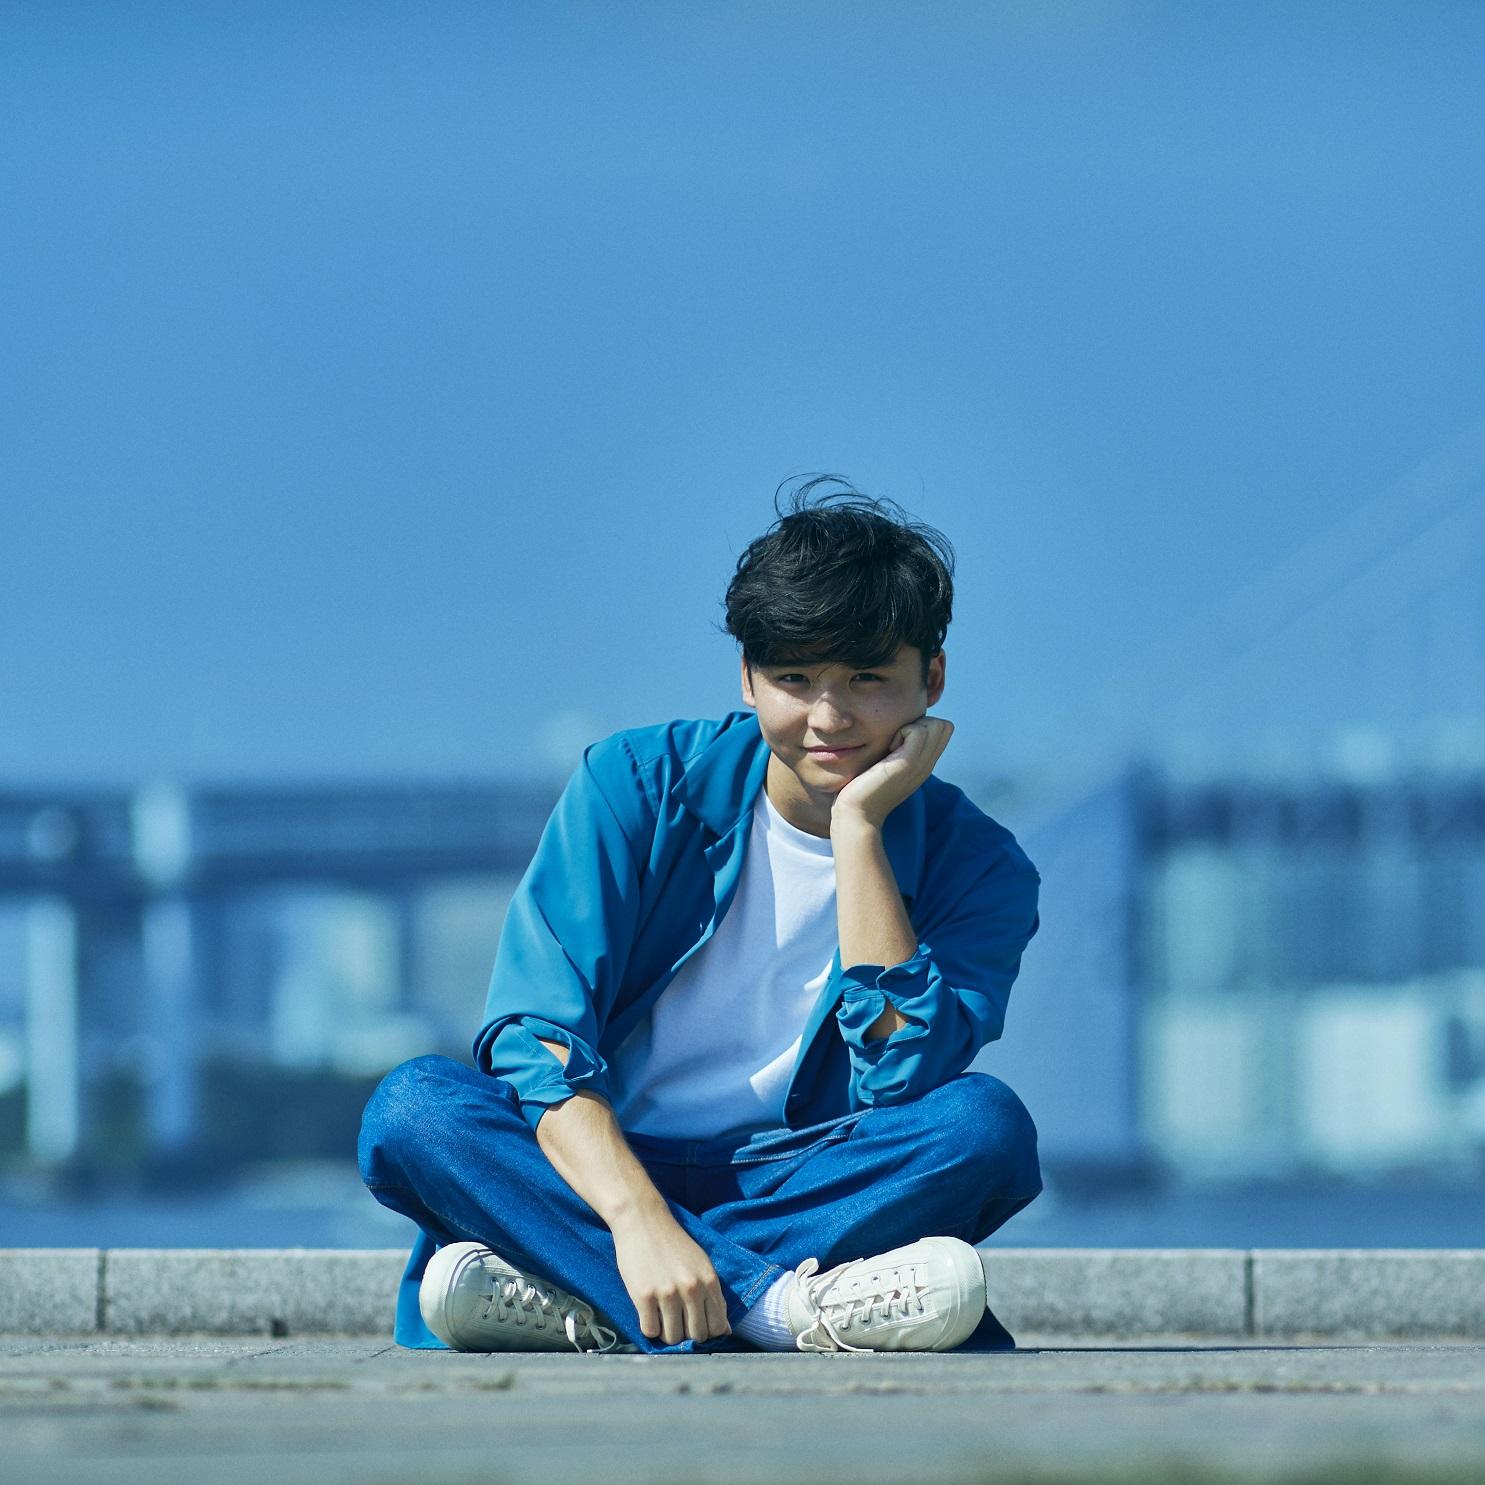 DedachiKenta、新曲「Life Line」のMVをフル公開サムネイル画像